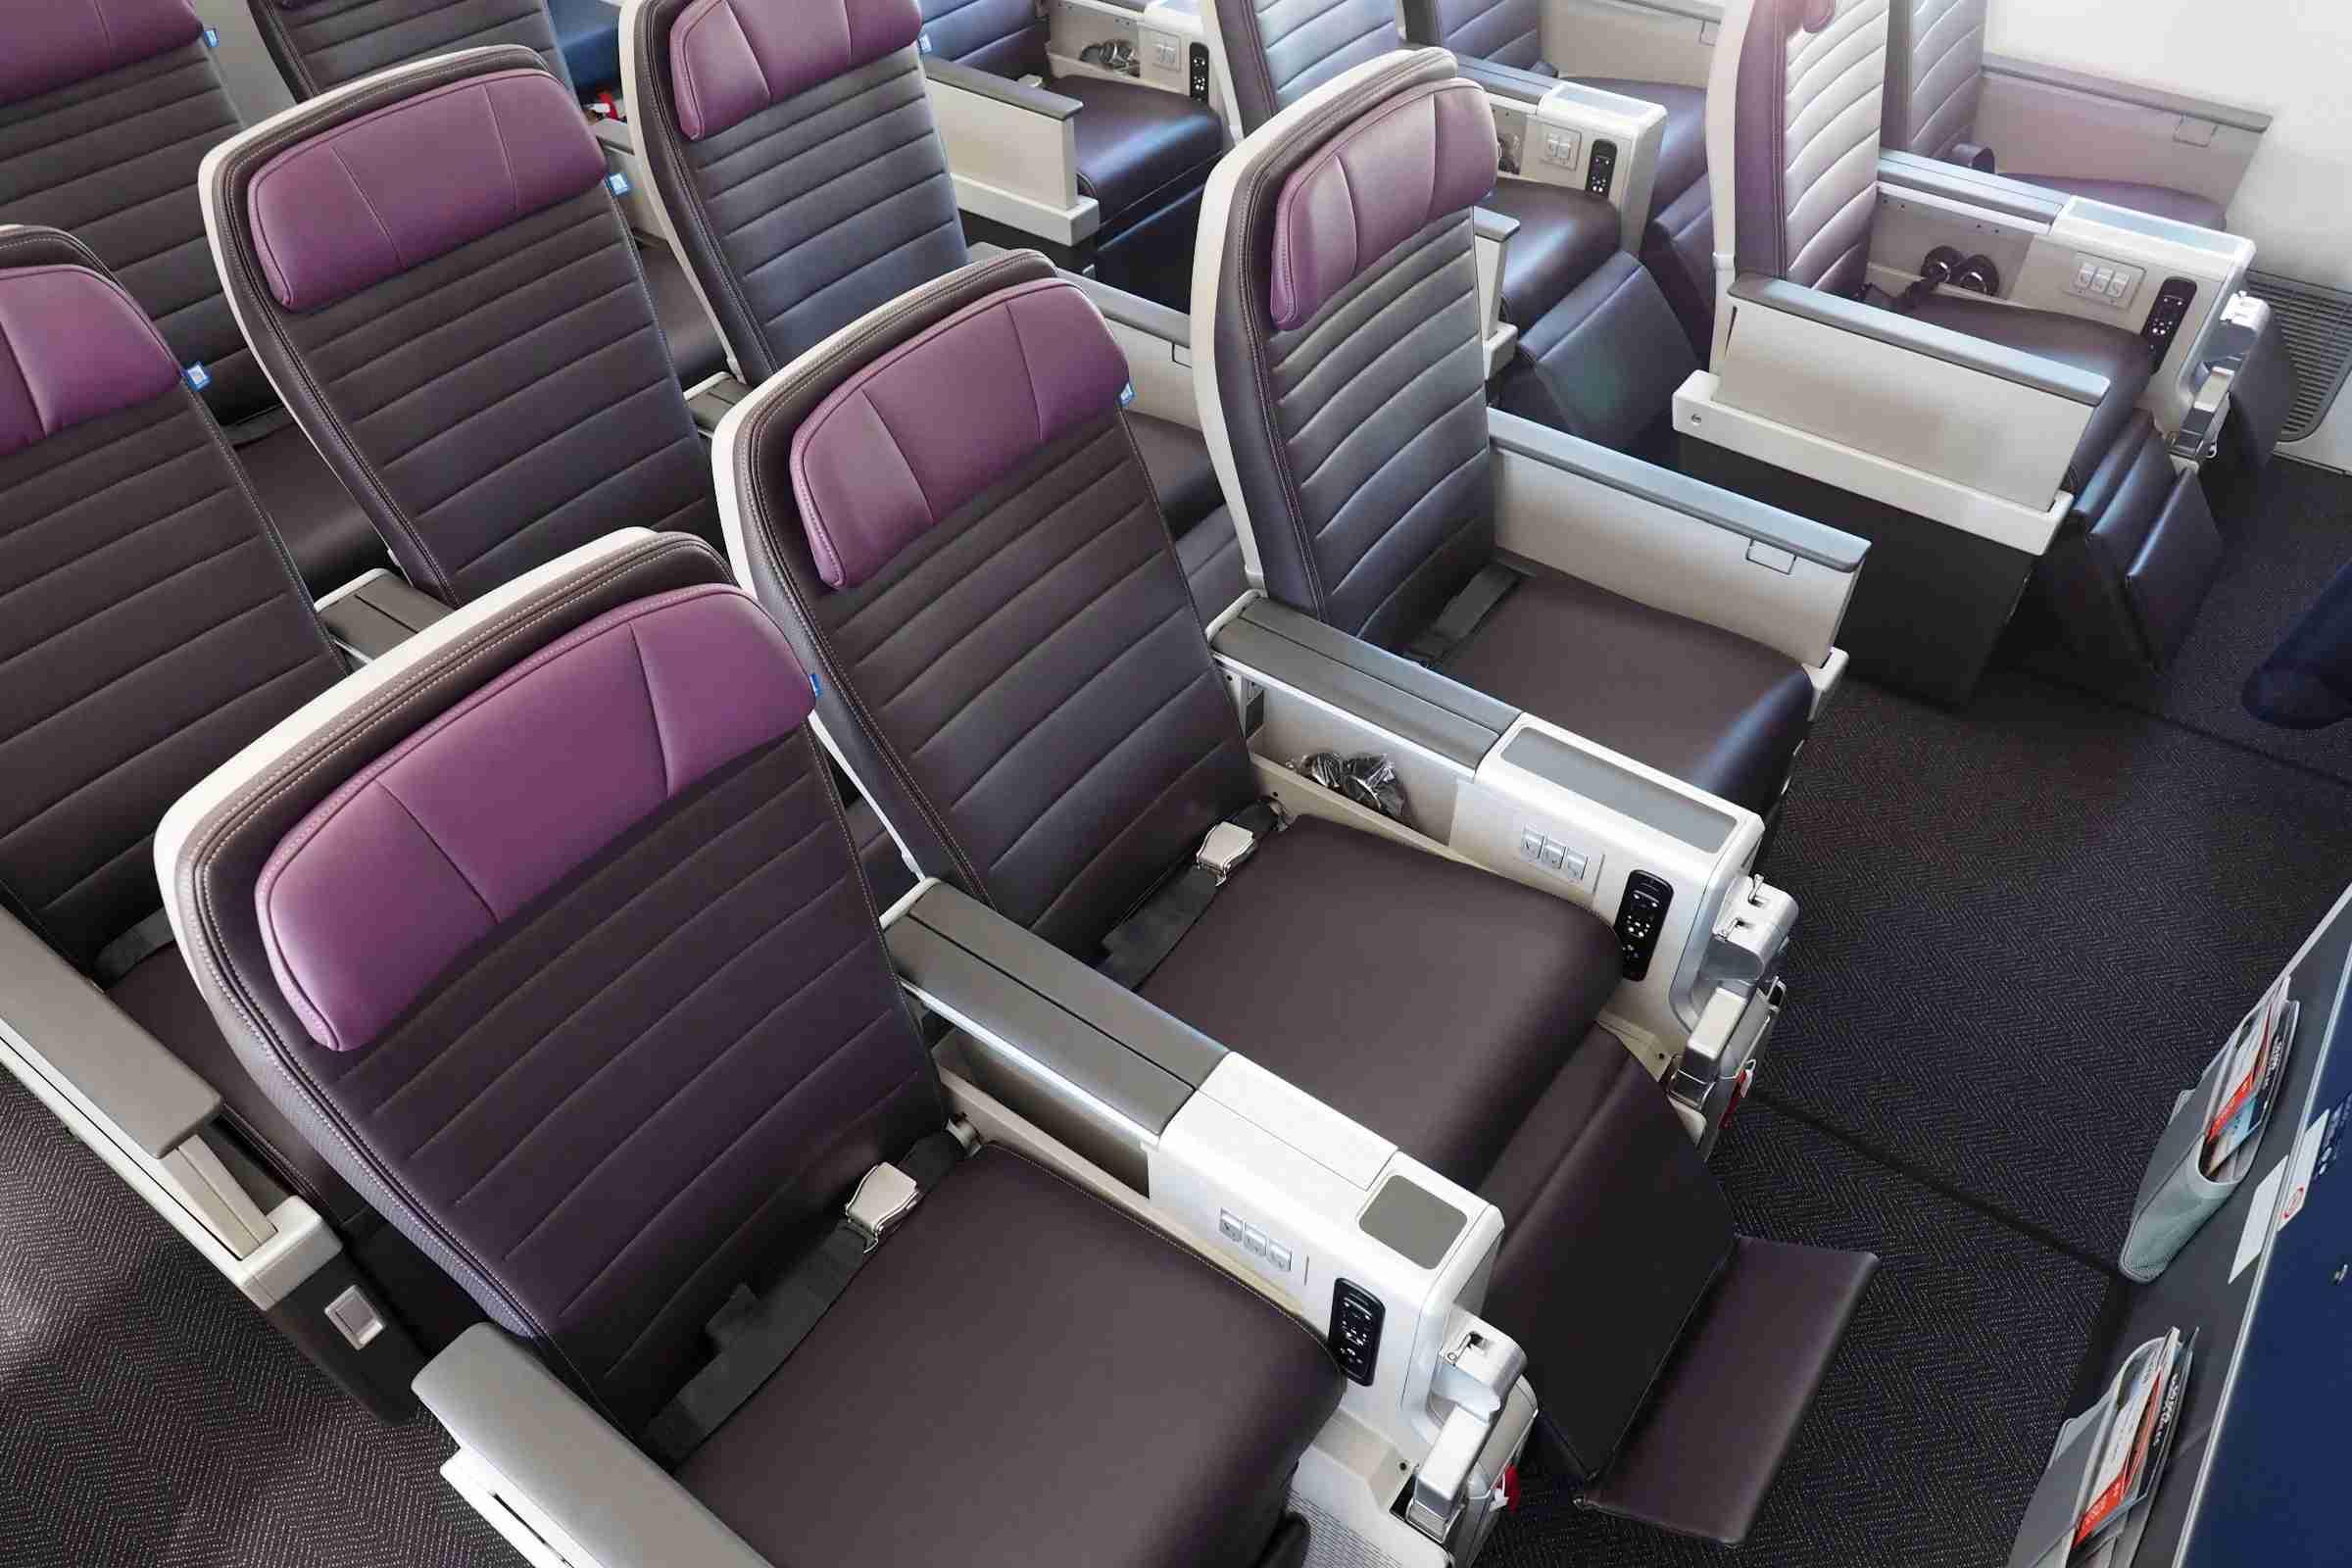 United Premium plus on the 787-10 Dreamliner. Photo by Zach Honig.